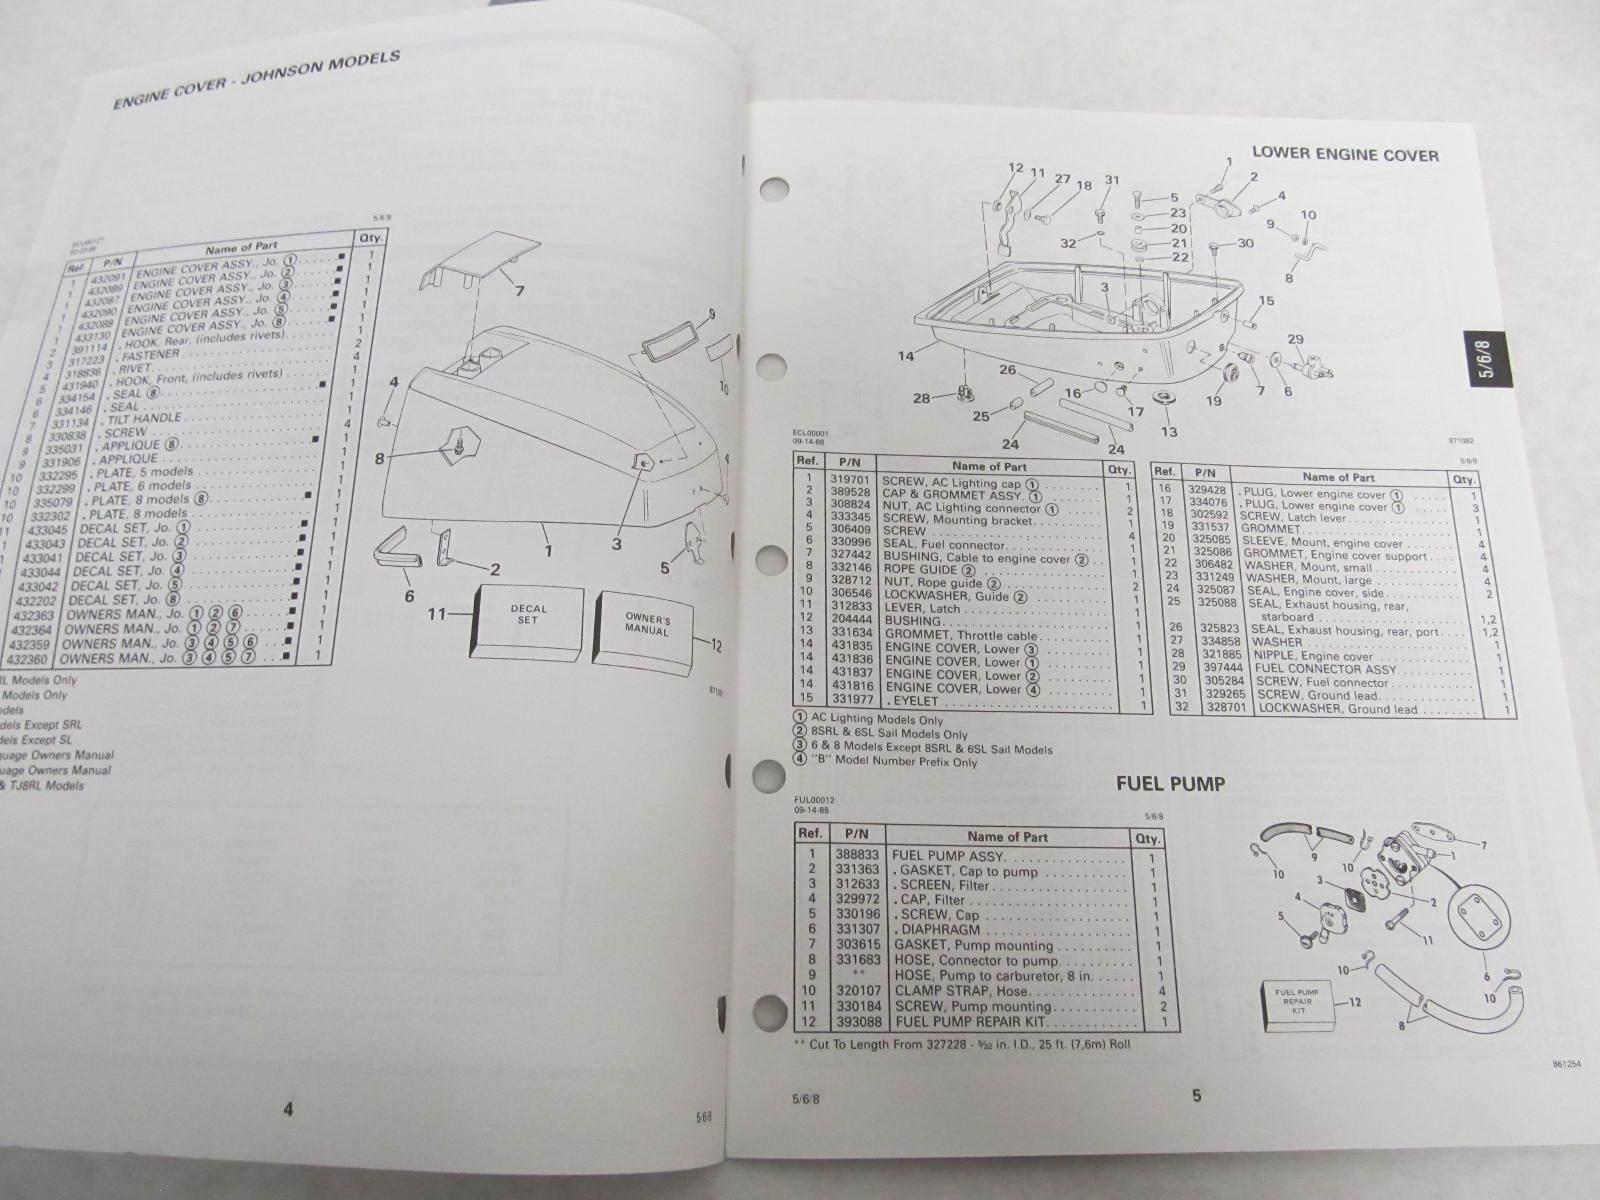 432878 omc evinrude johnson 1989 outboard 5 8 hp parts. Black Bedroom Furniture Sets. Home Design Ideas